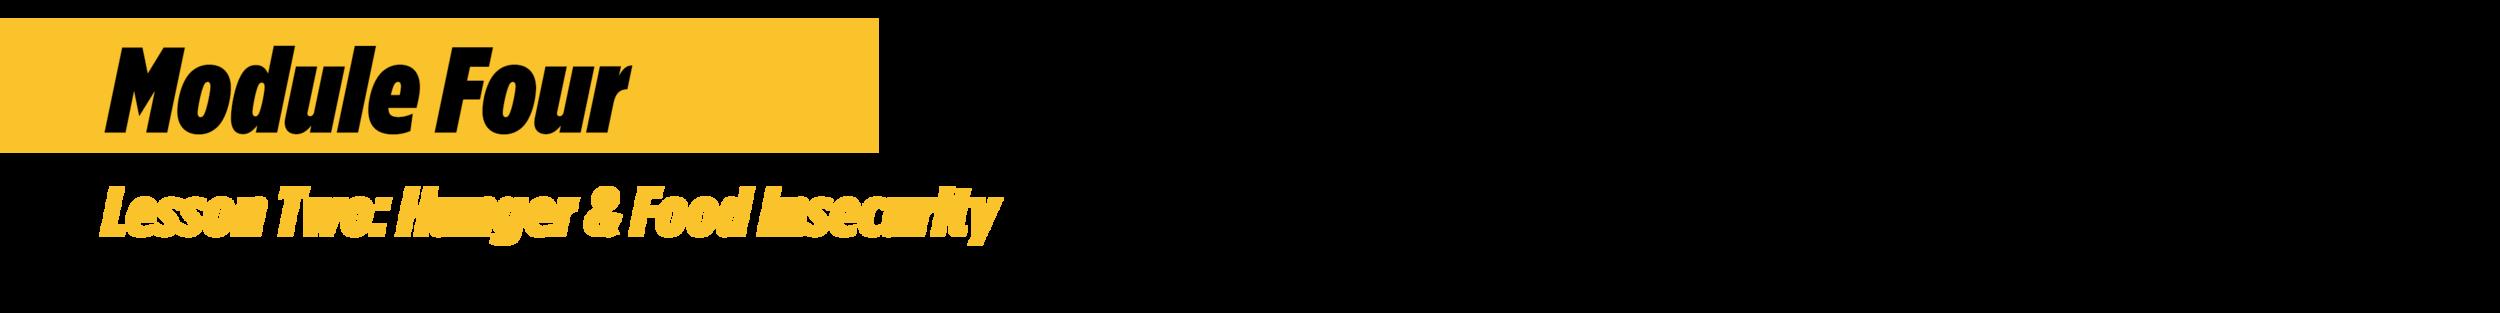 Module-Four_Lesson-2-Banner.png